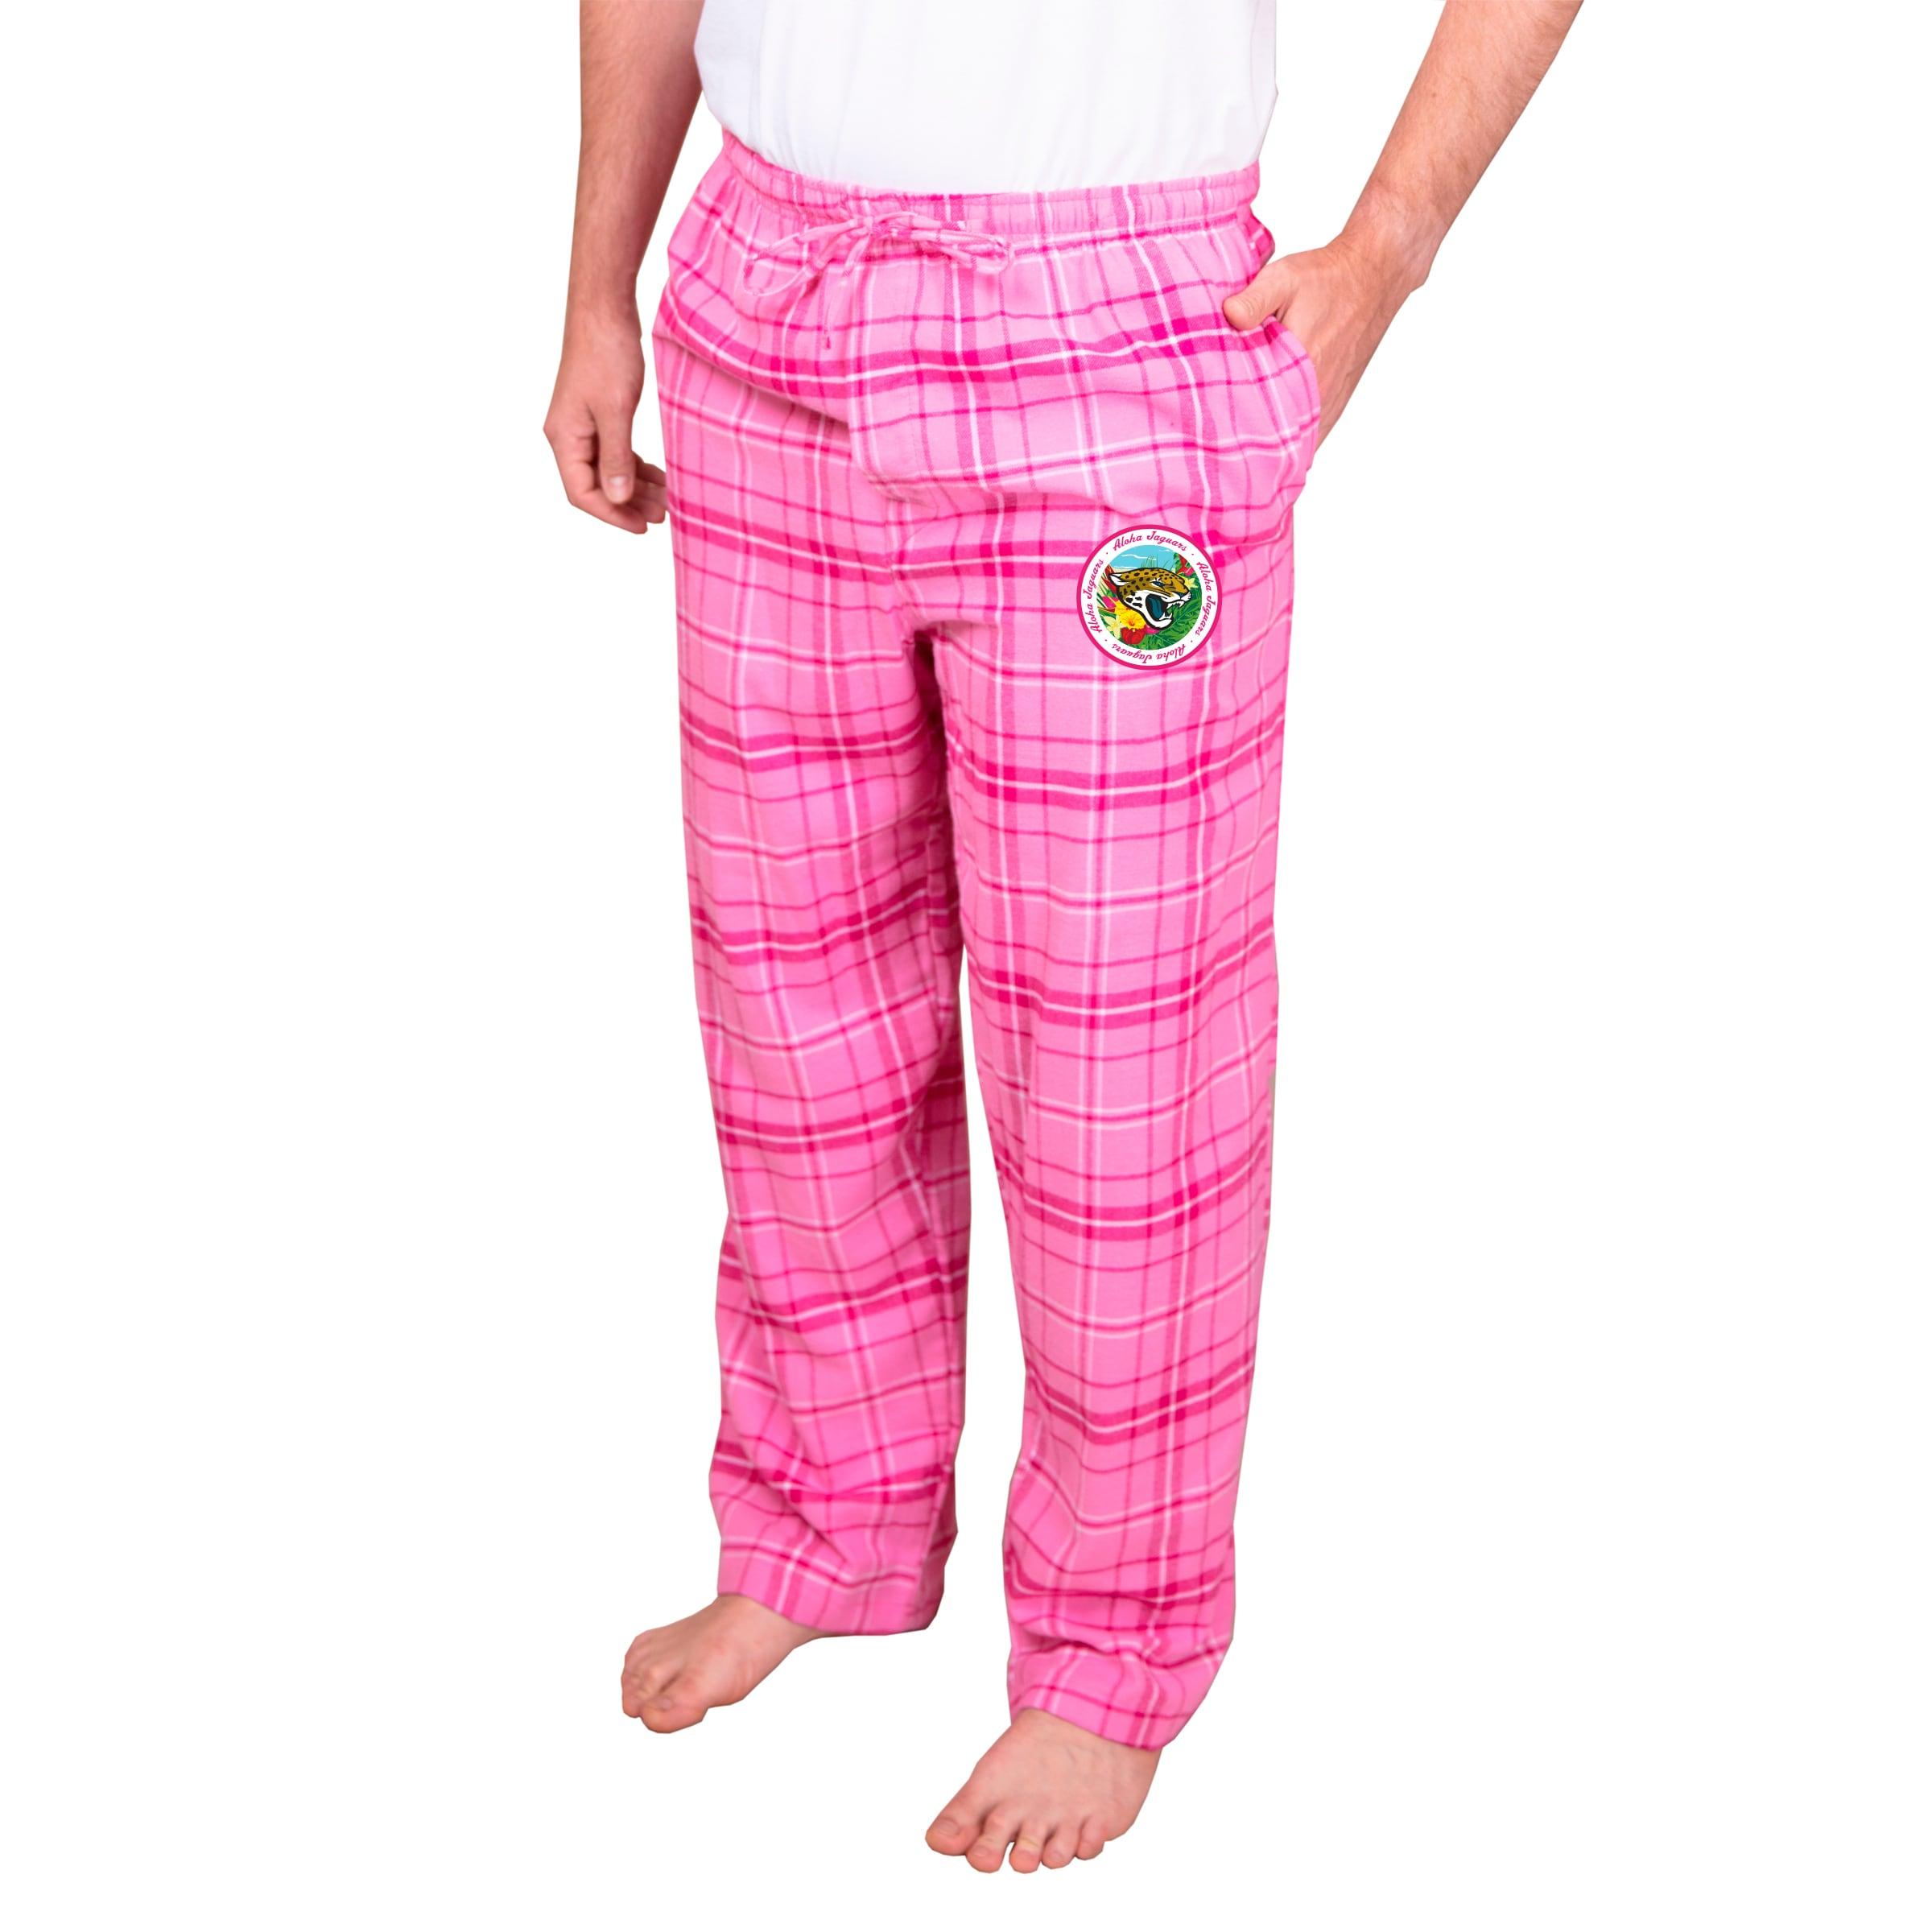 Jacksonville Jaguars Concepts Sport Ultimate Pants - Pink